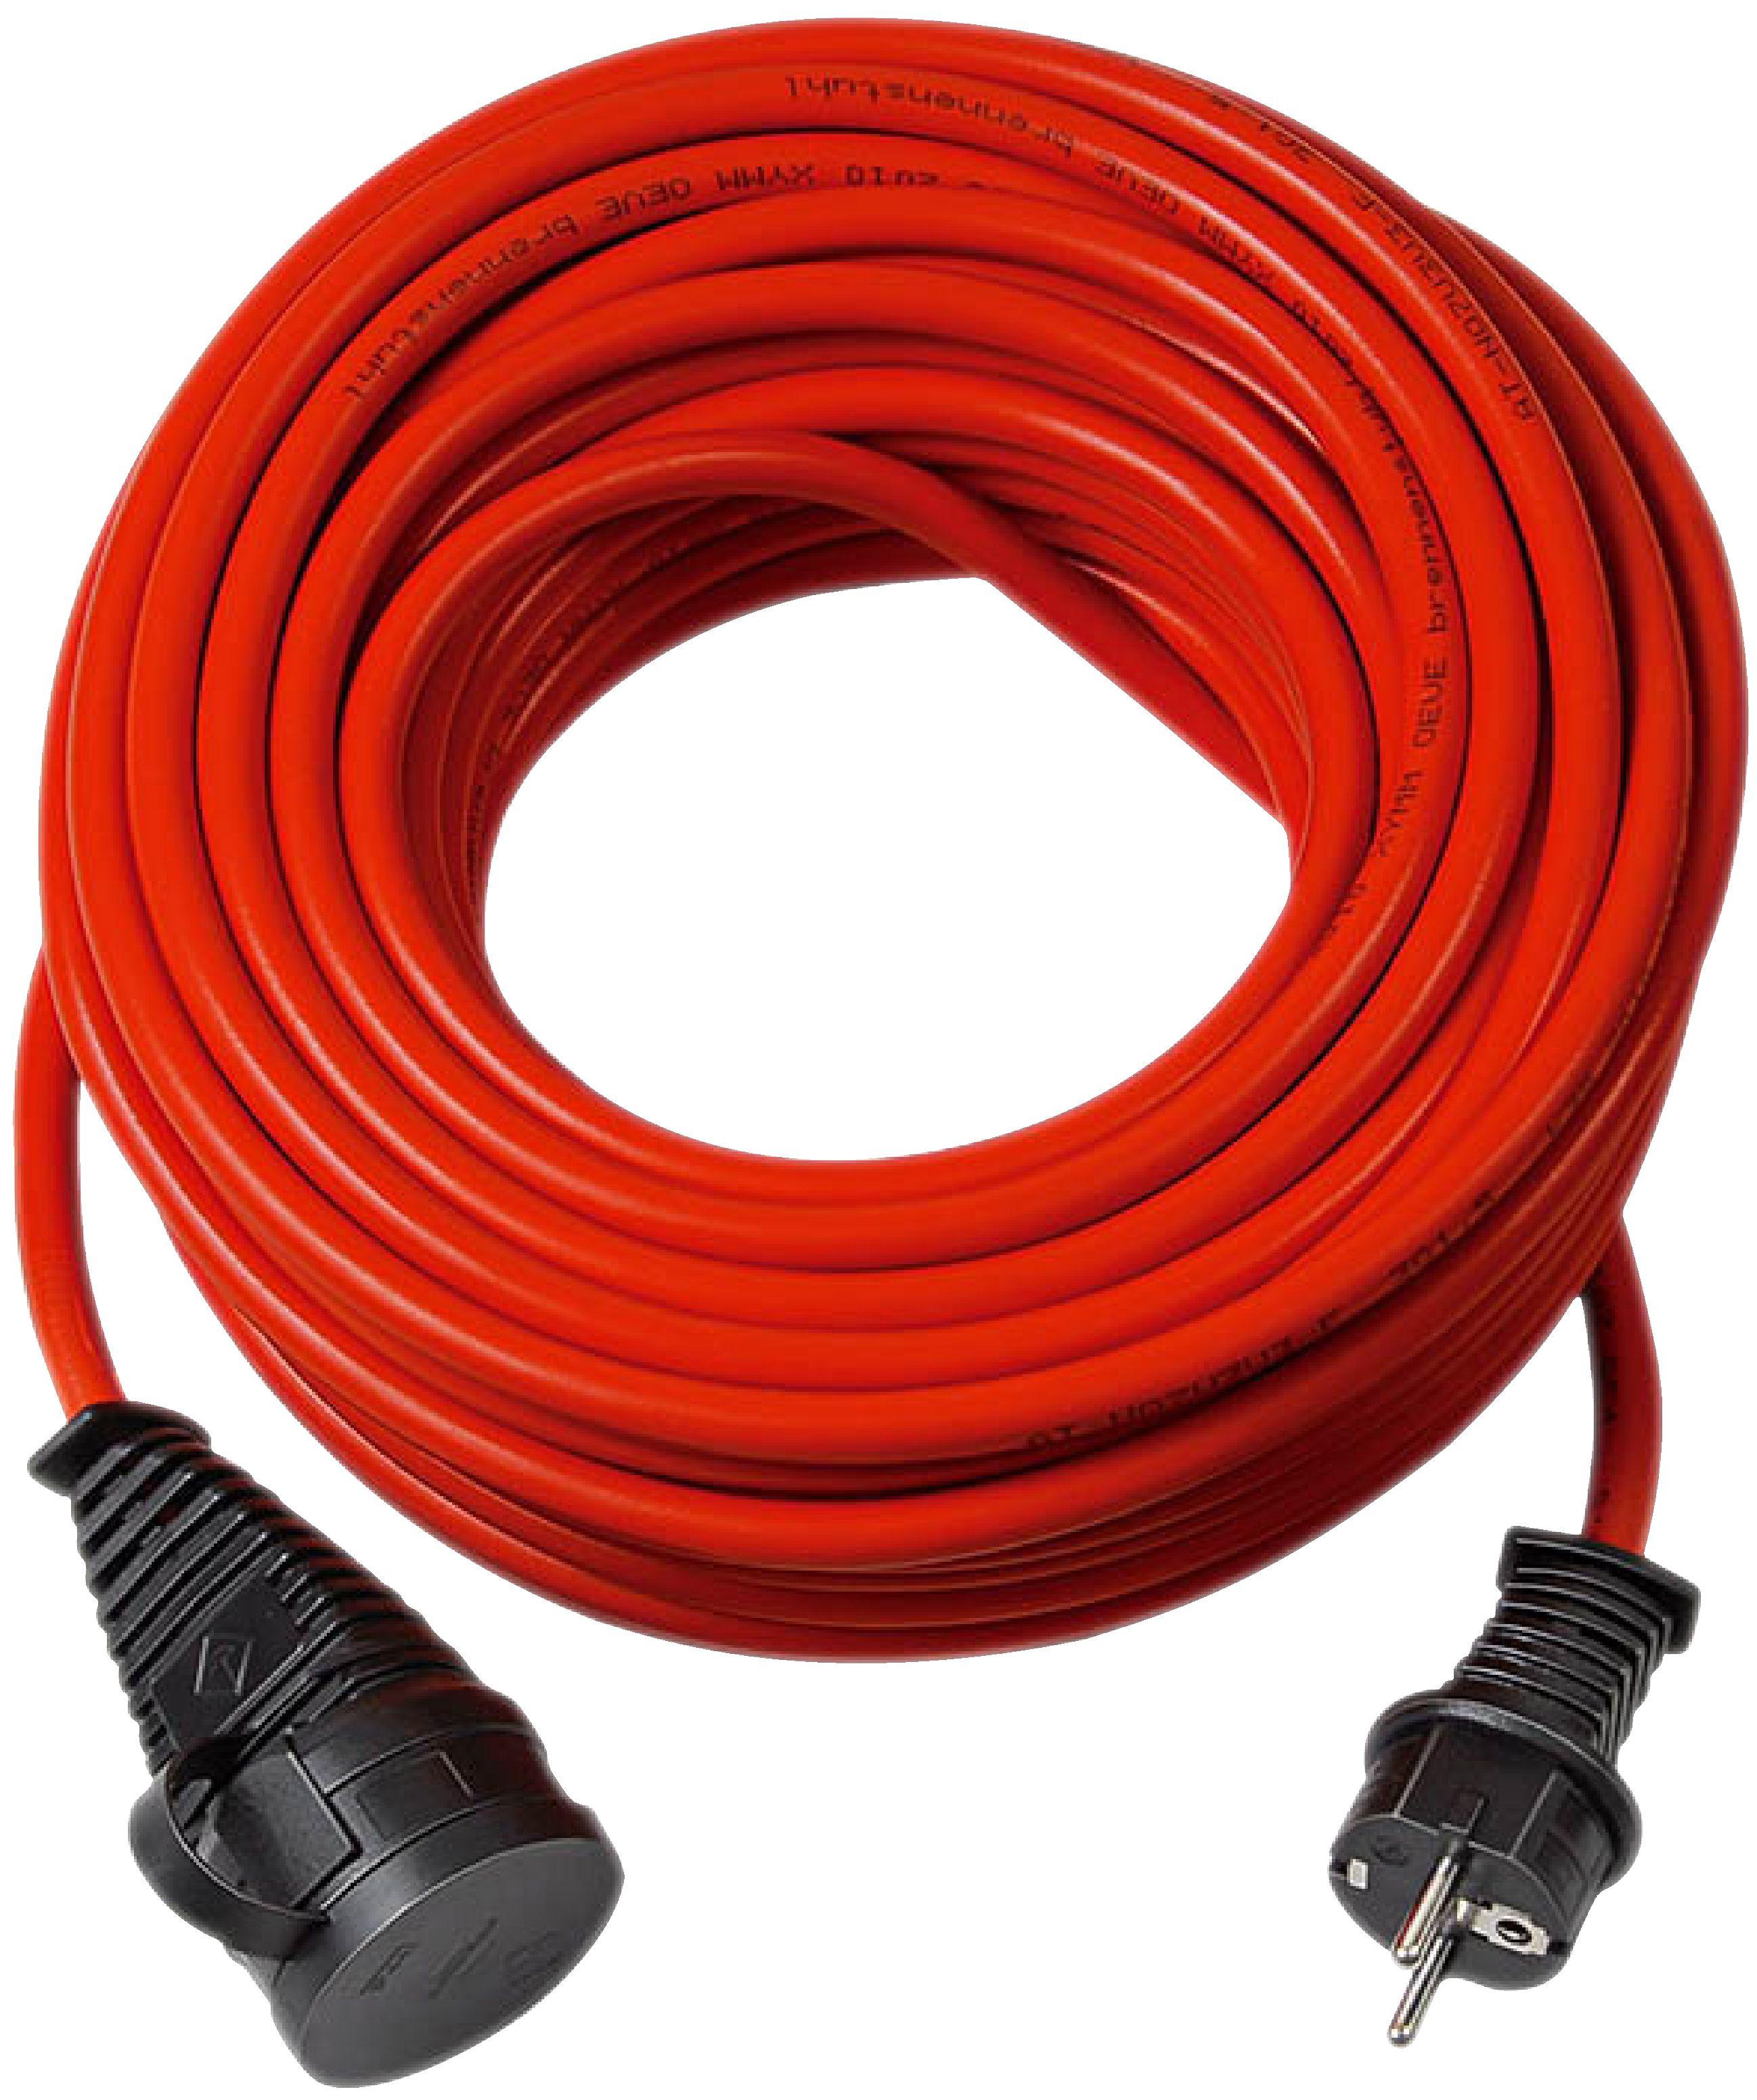 Bremaxx prodlužovací kabel IP 44, 25 m Brennenstuhl BN-1169840